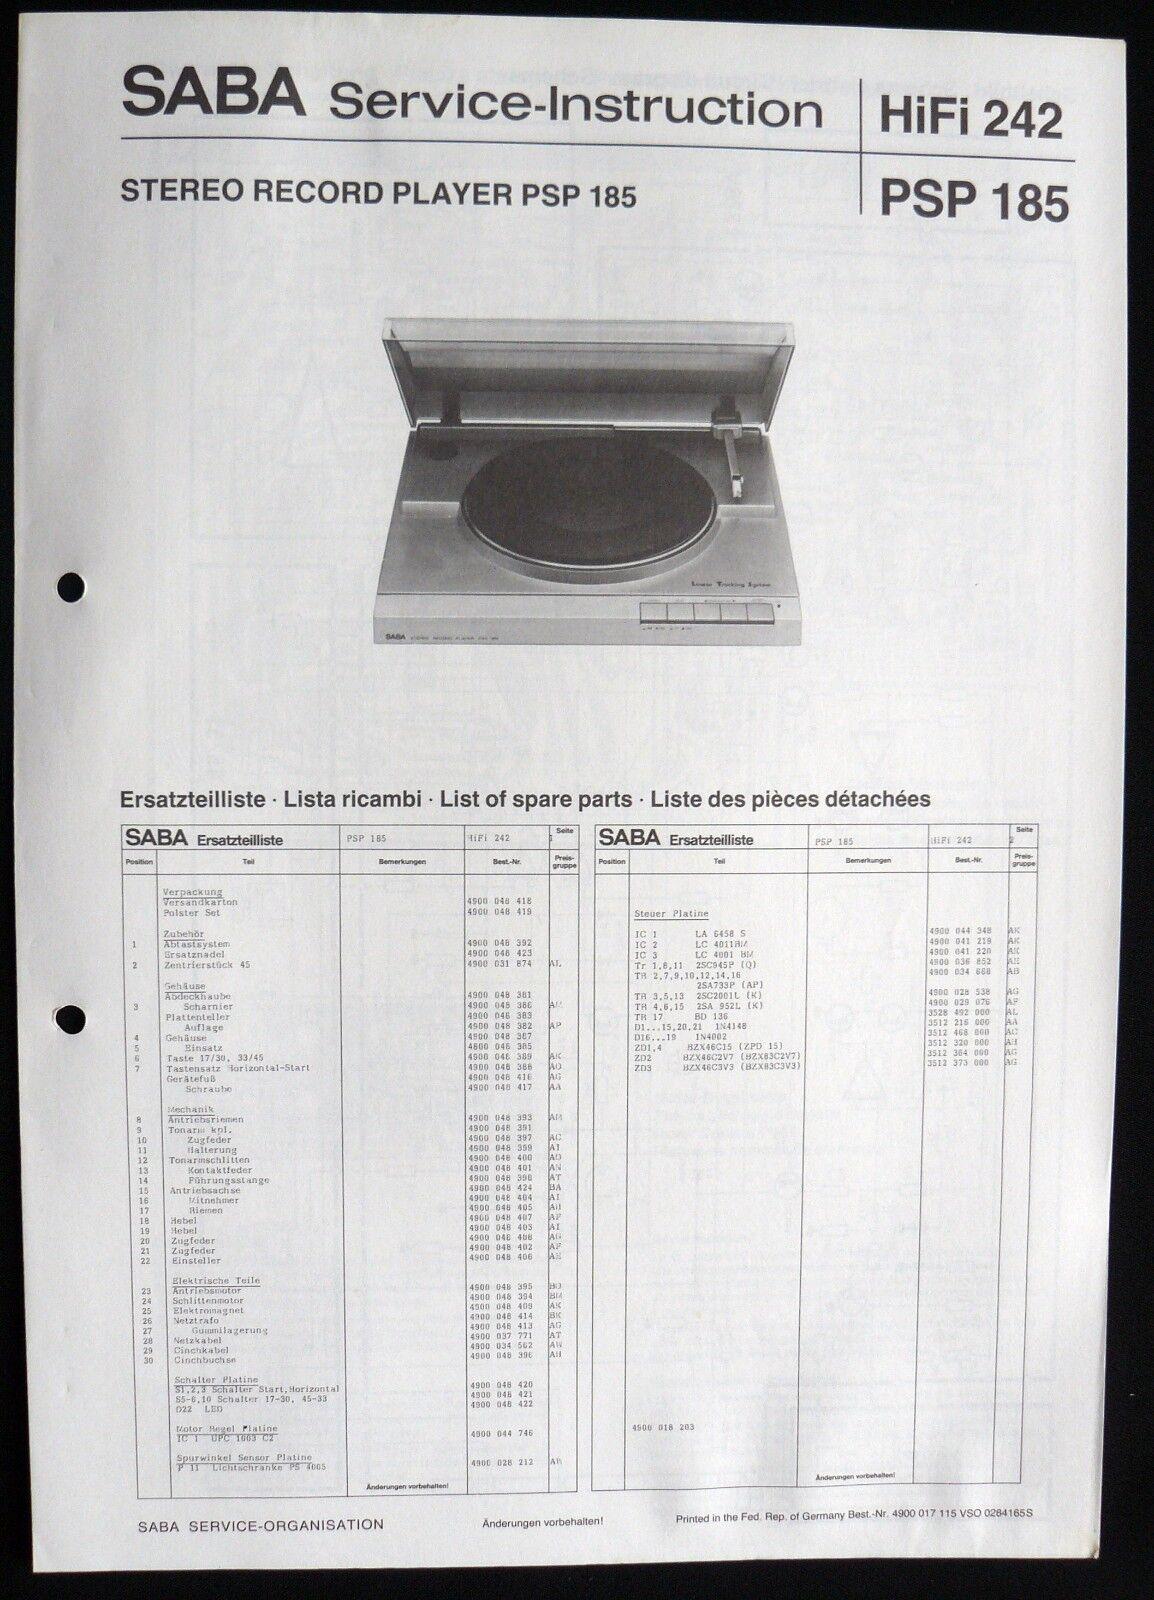 SABA HiFi 242-PSP 185 Plattenspieler Ersatzteillageplan Service-Instruction